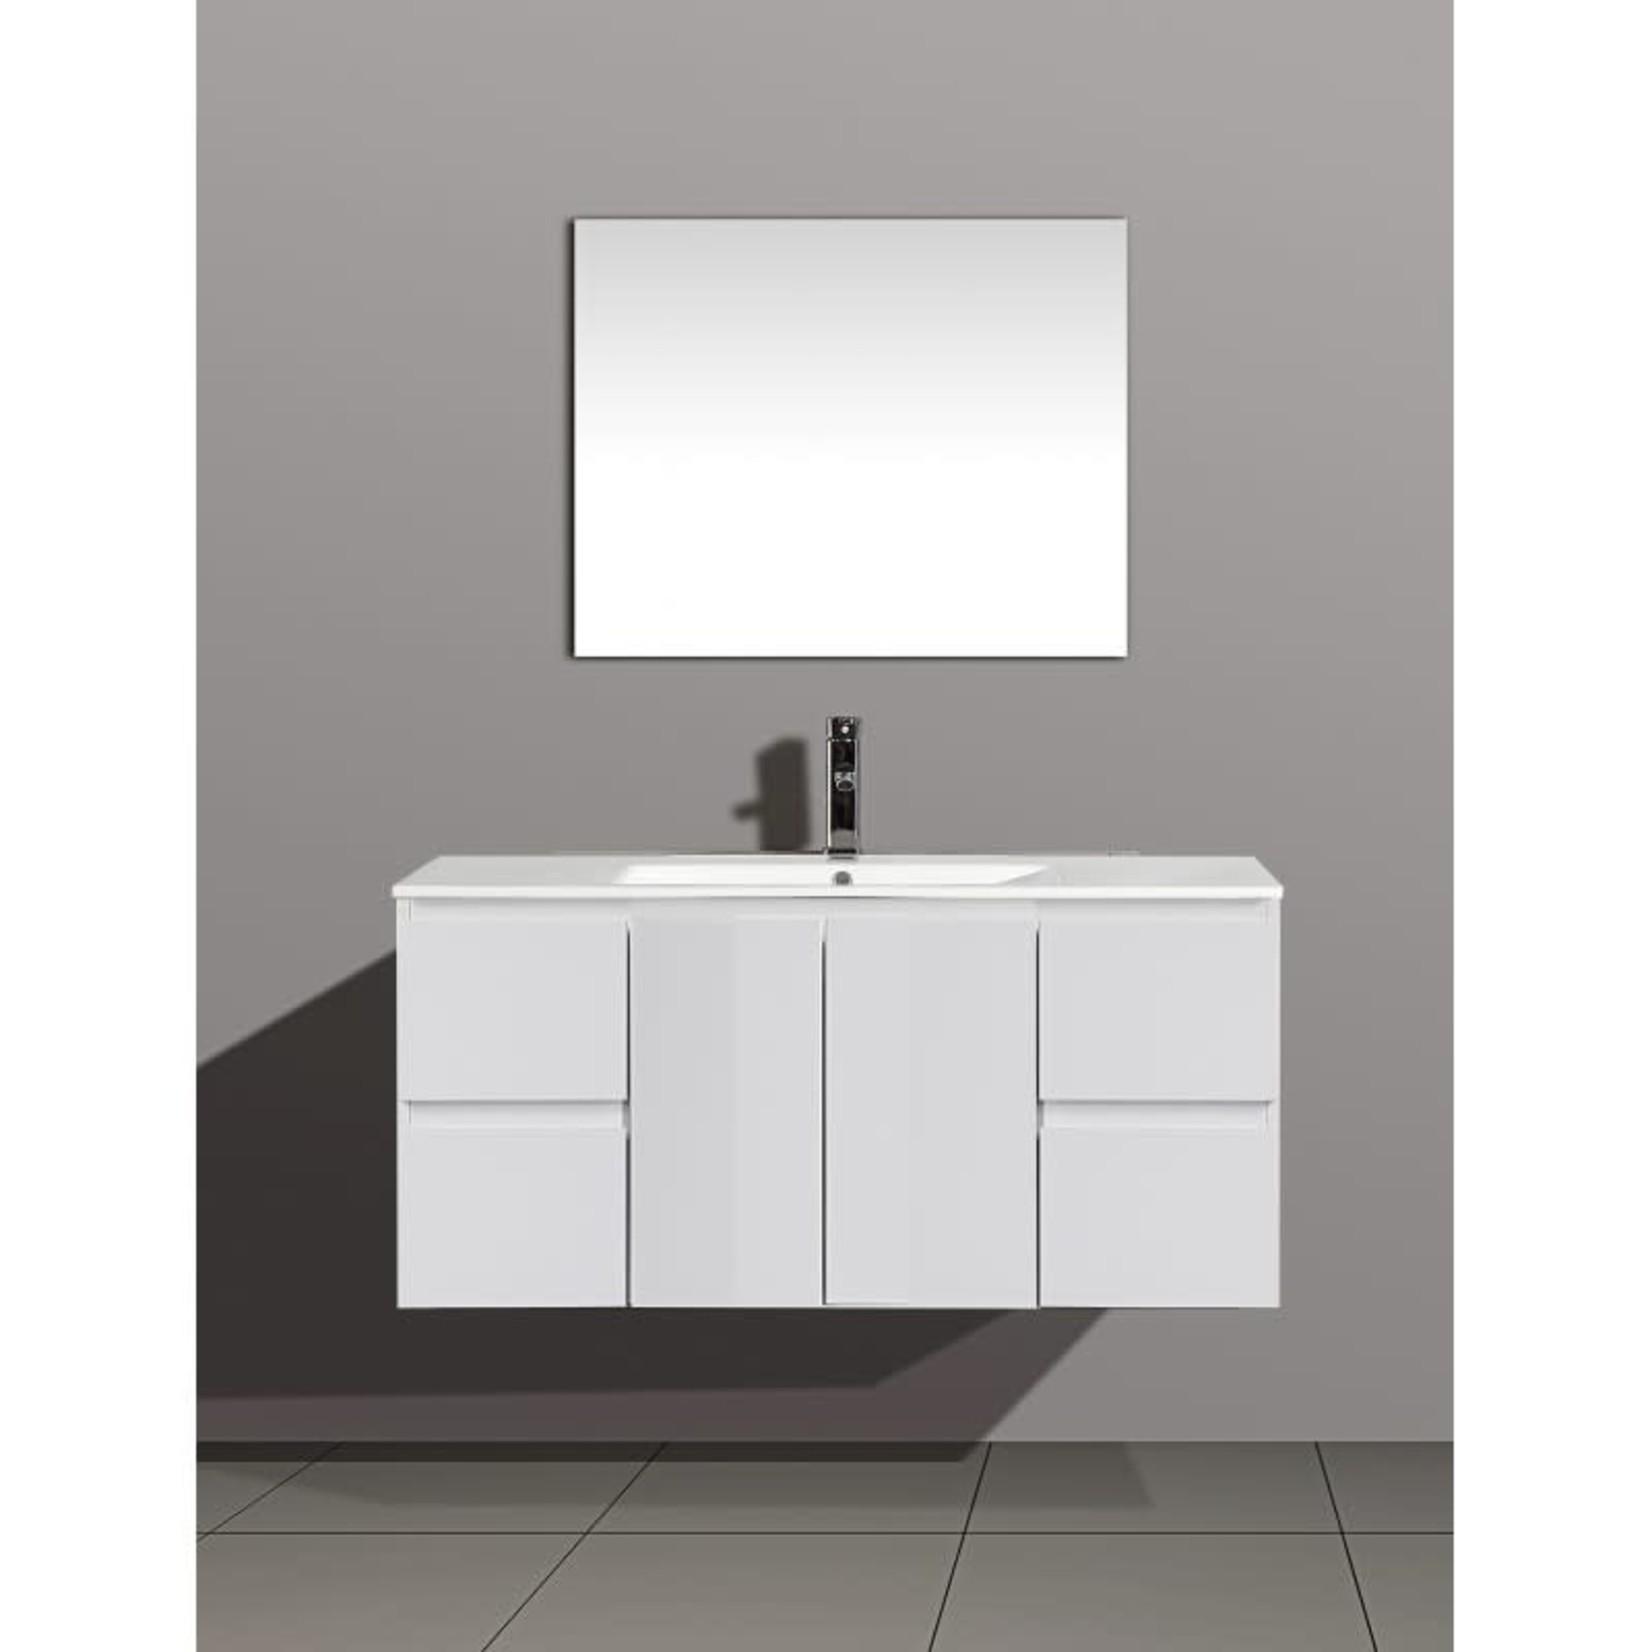 White Floating Vanity Everest 48 '' 31120